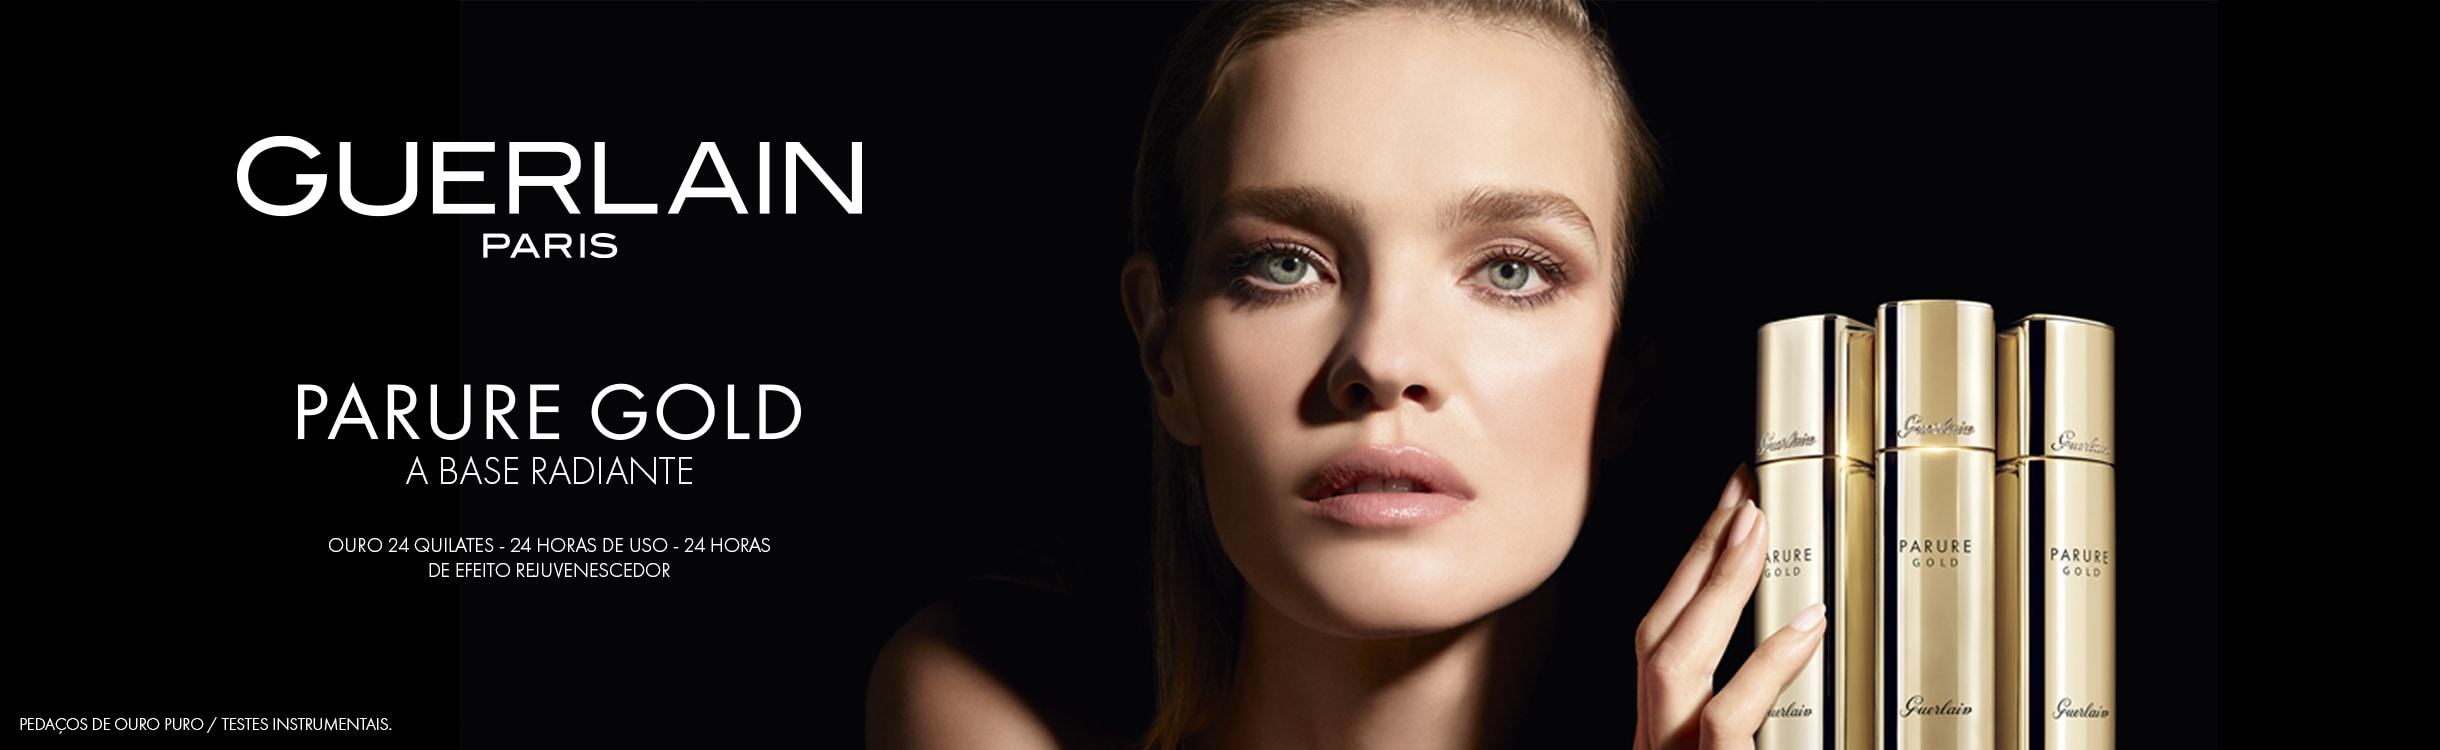 Acessórios Guerlain para Maquiagem